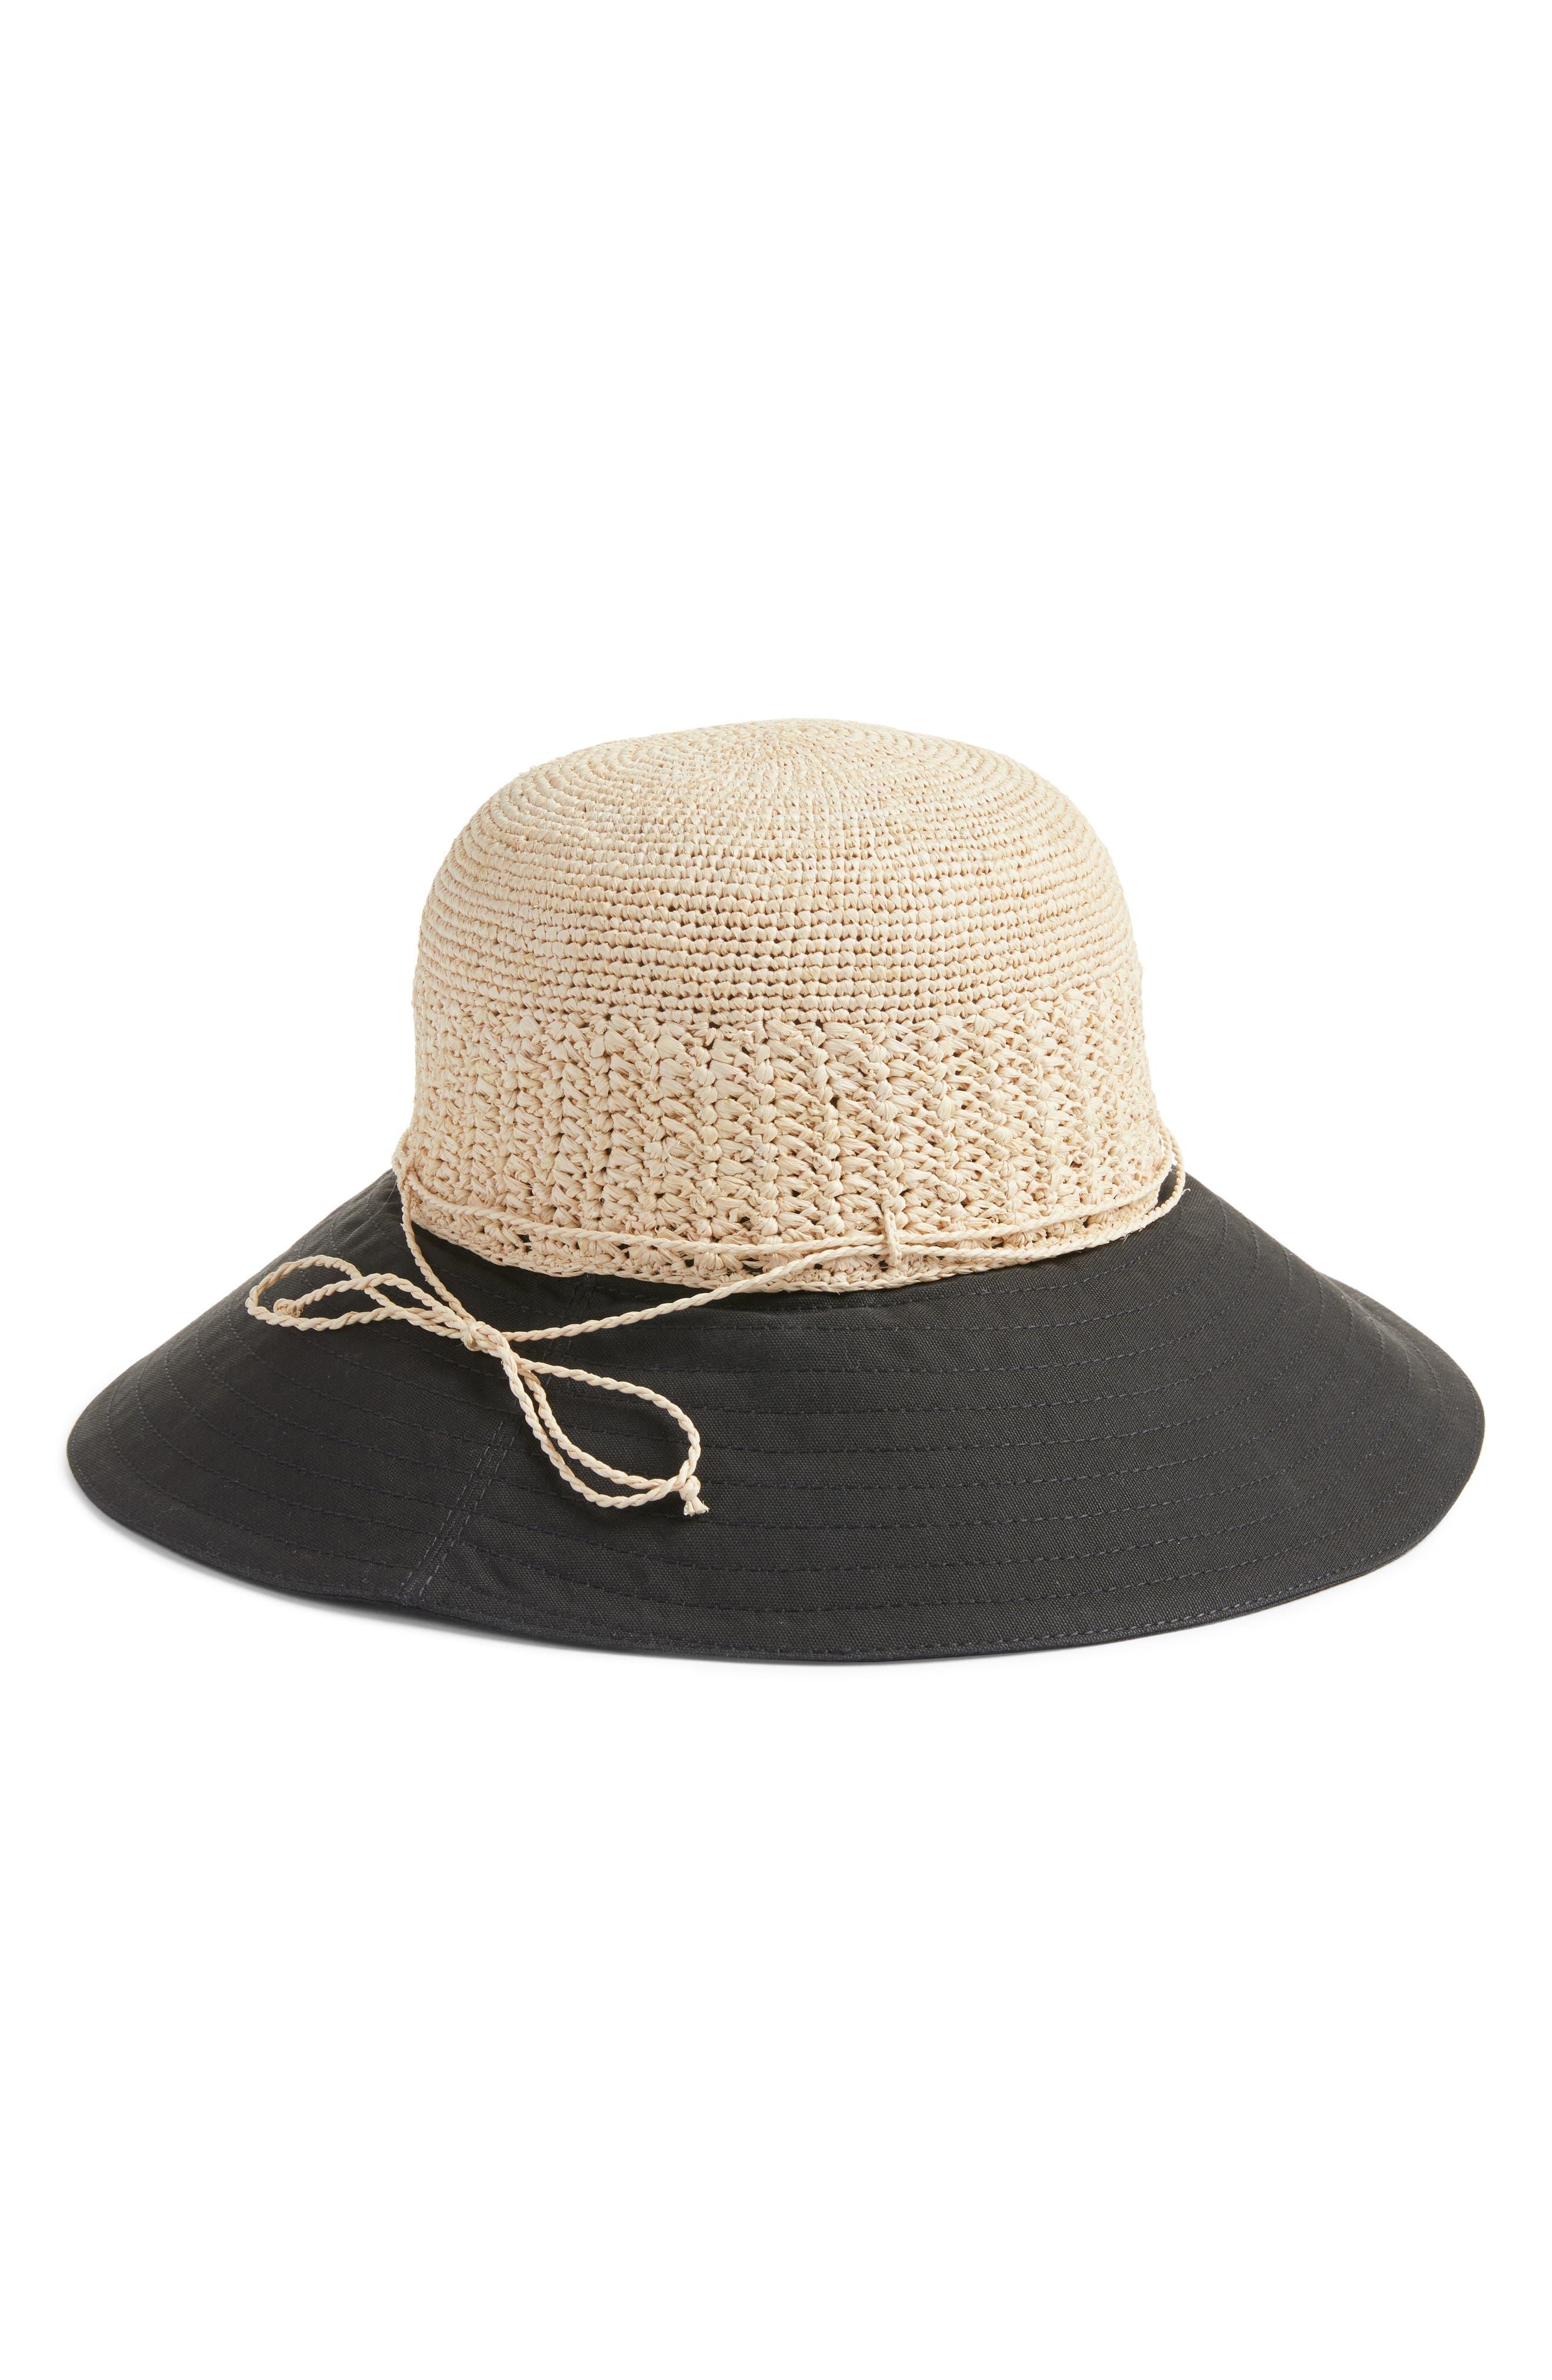 Helen Kaminski Raffia & Canvas Hat